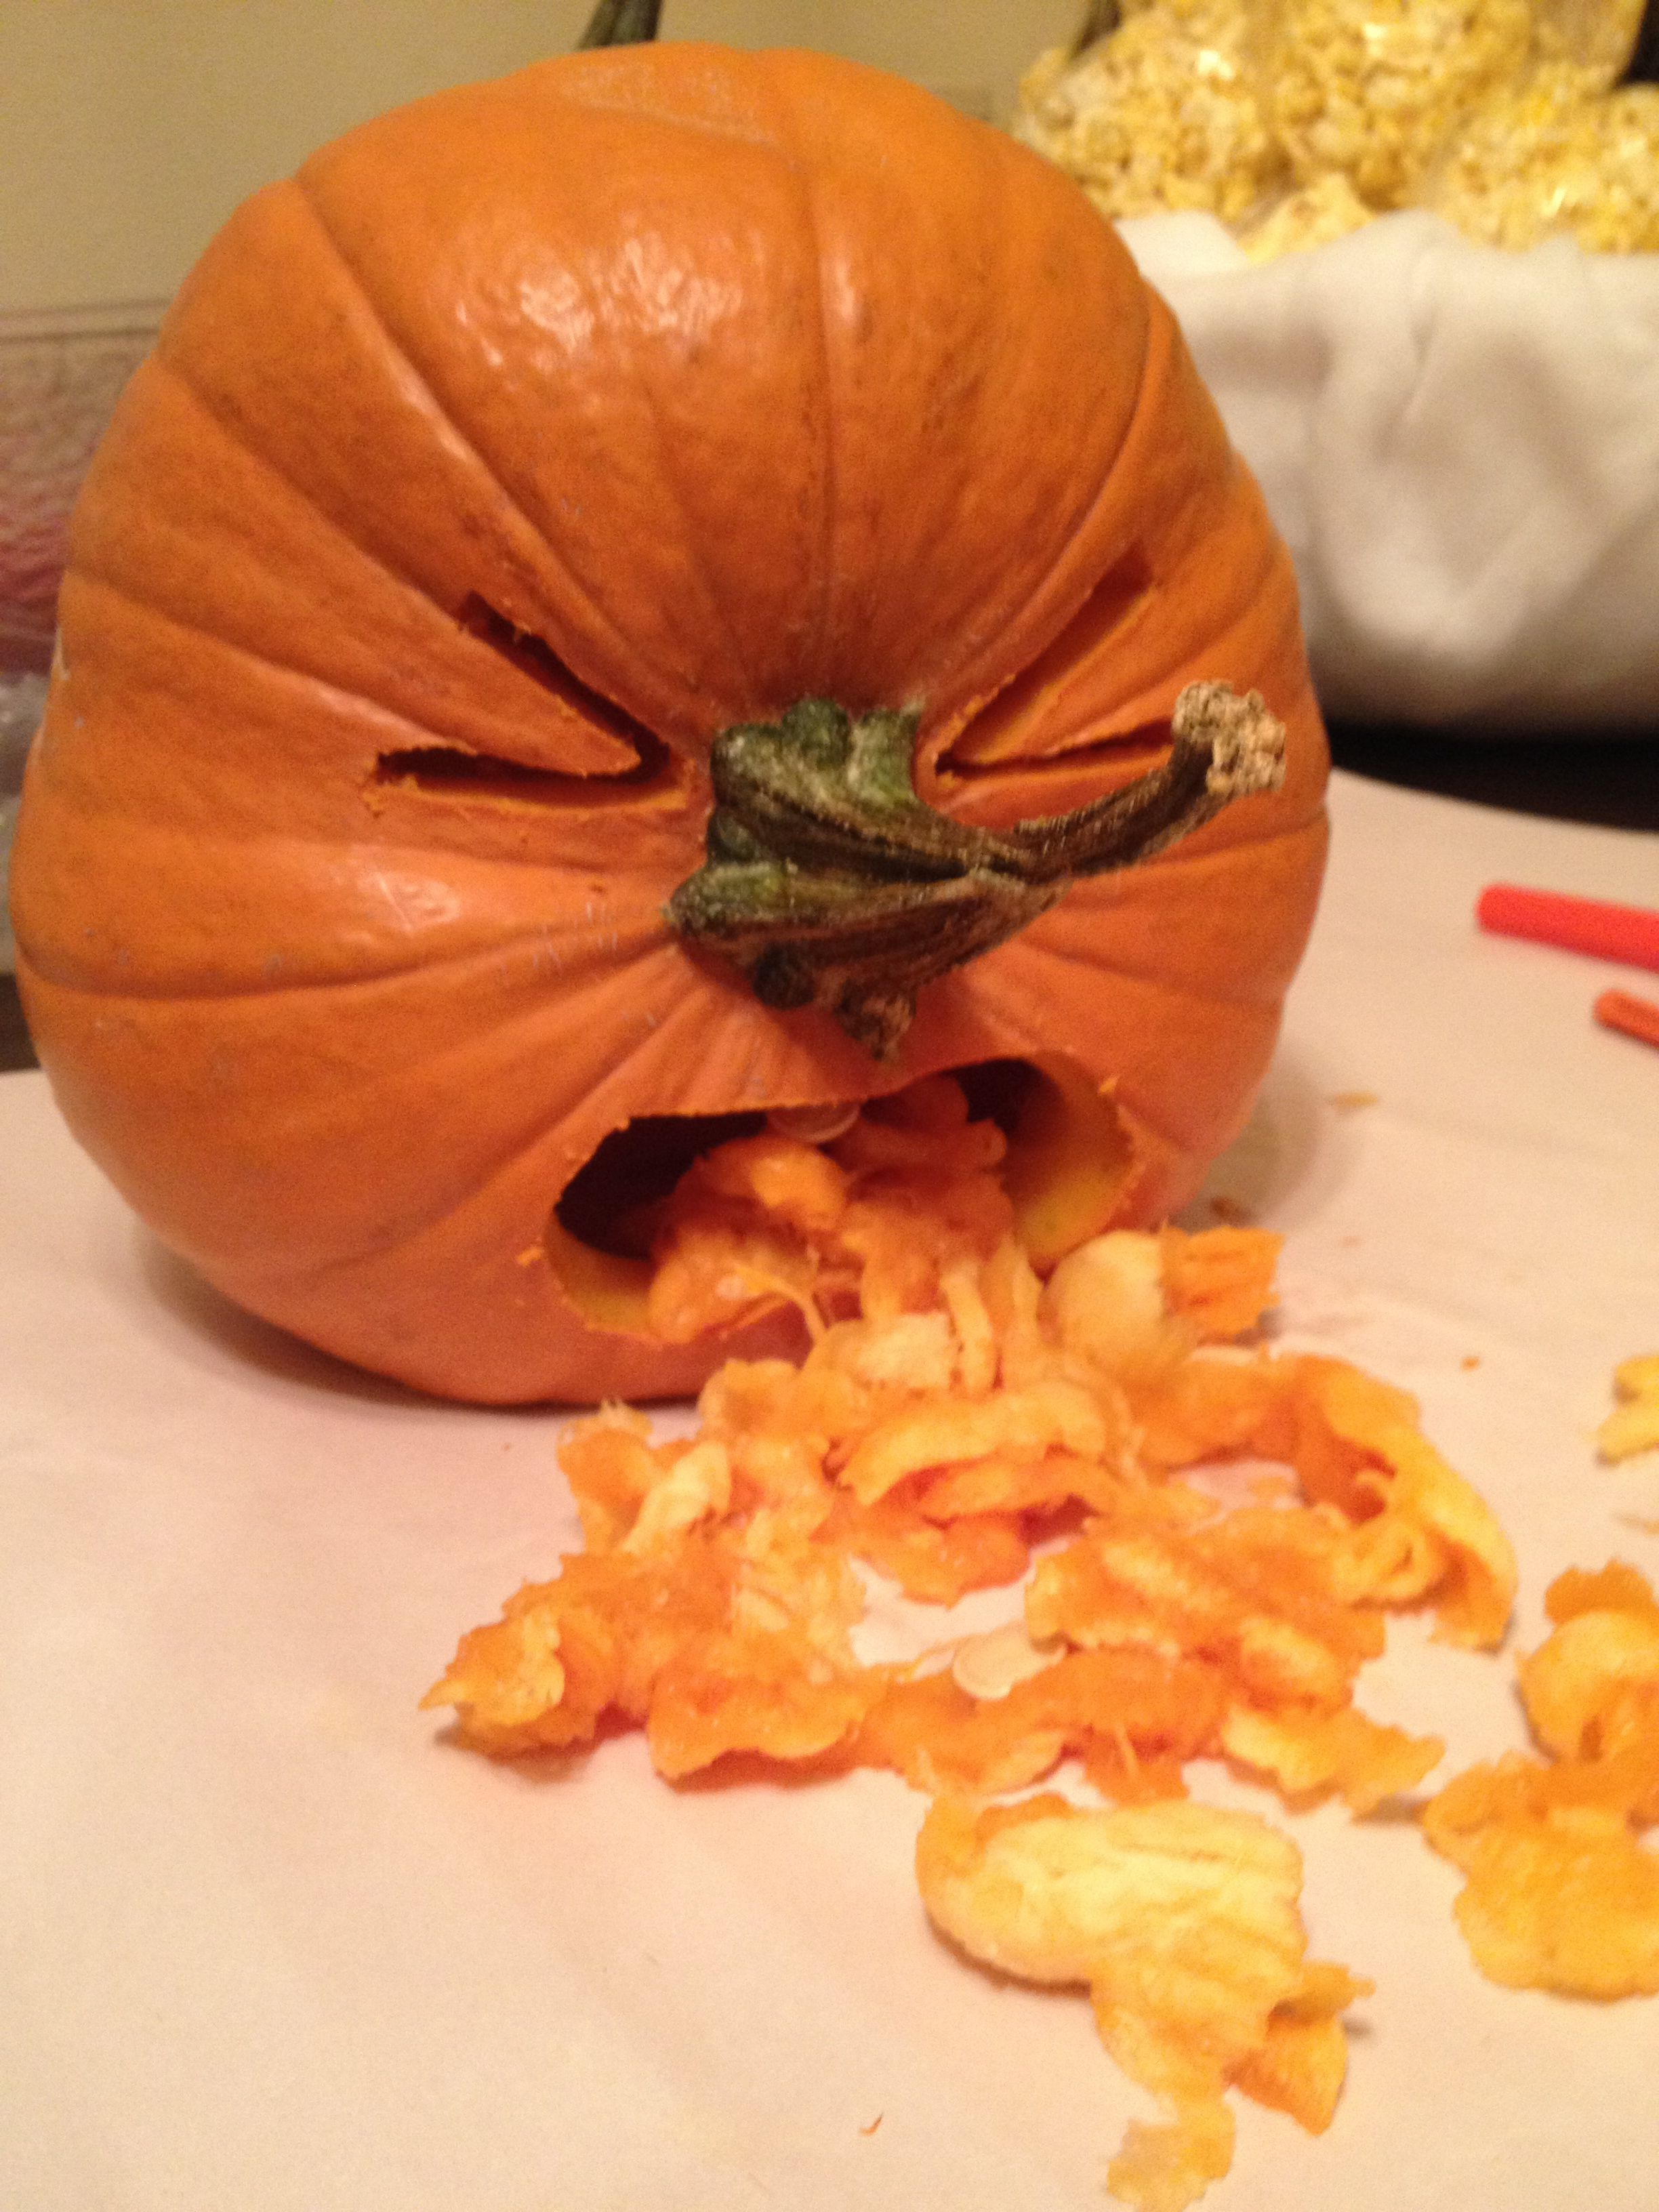 Throw-up pumpkin. Vomiting jack-o-lantern. | Halloween party drinks,  Amazing pumpkin carving, Creative pumpkin carving